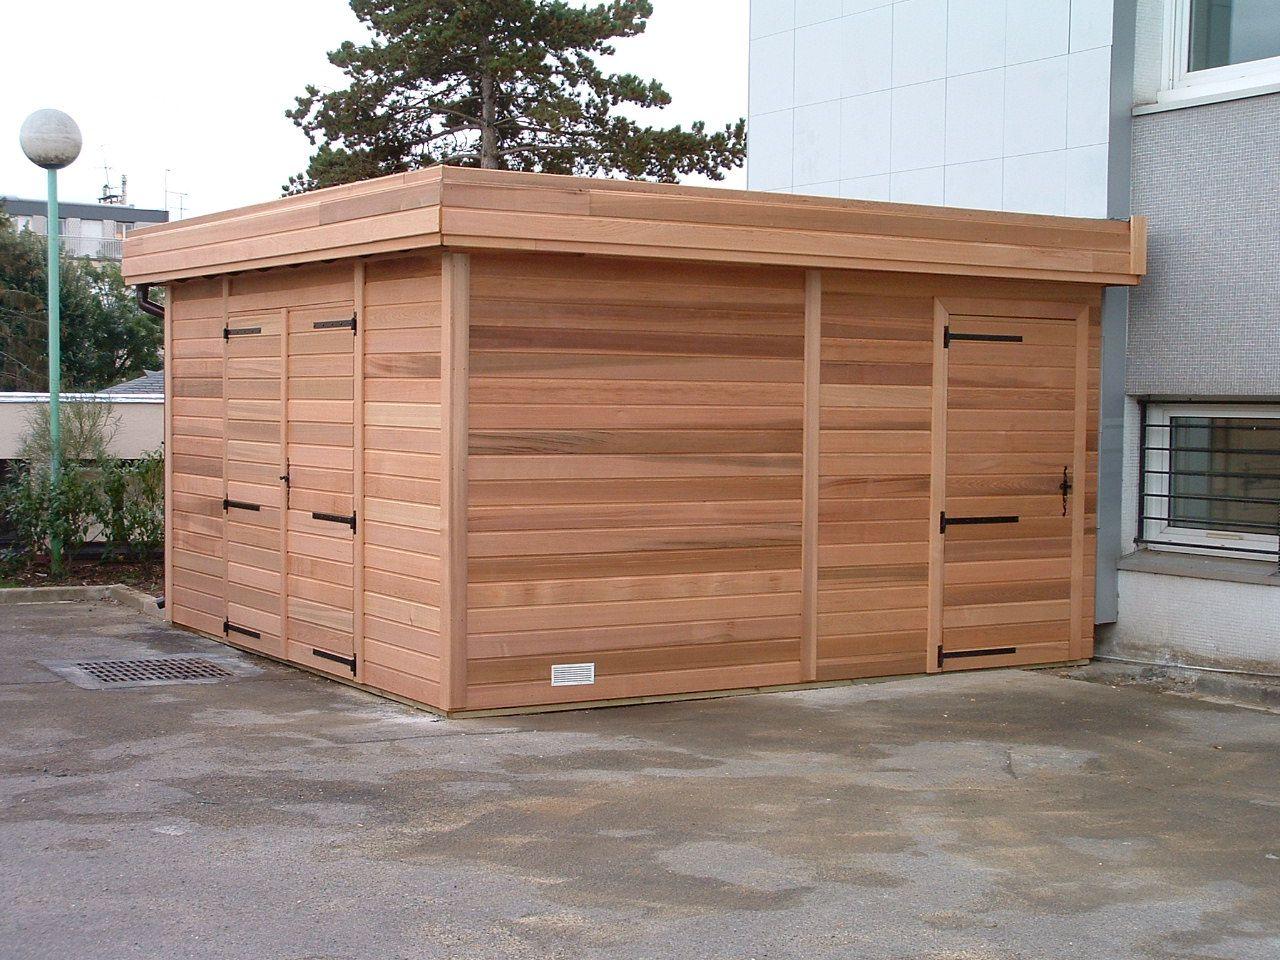 abri de jardin toit plat deco cedar shed garden in. Black Bedroom Furniture Sets. Home Design Ideas